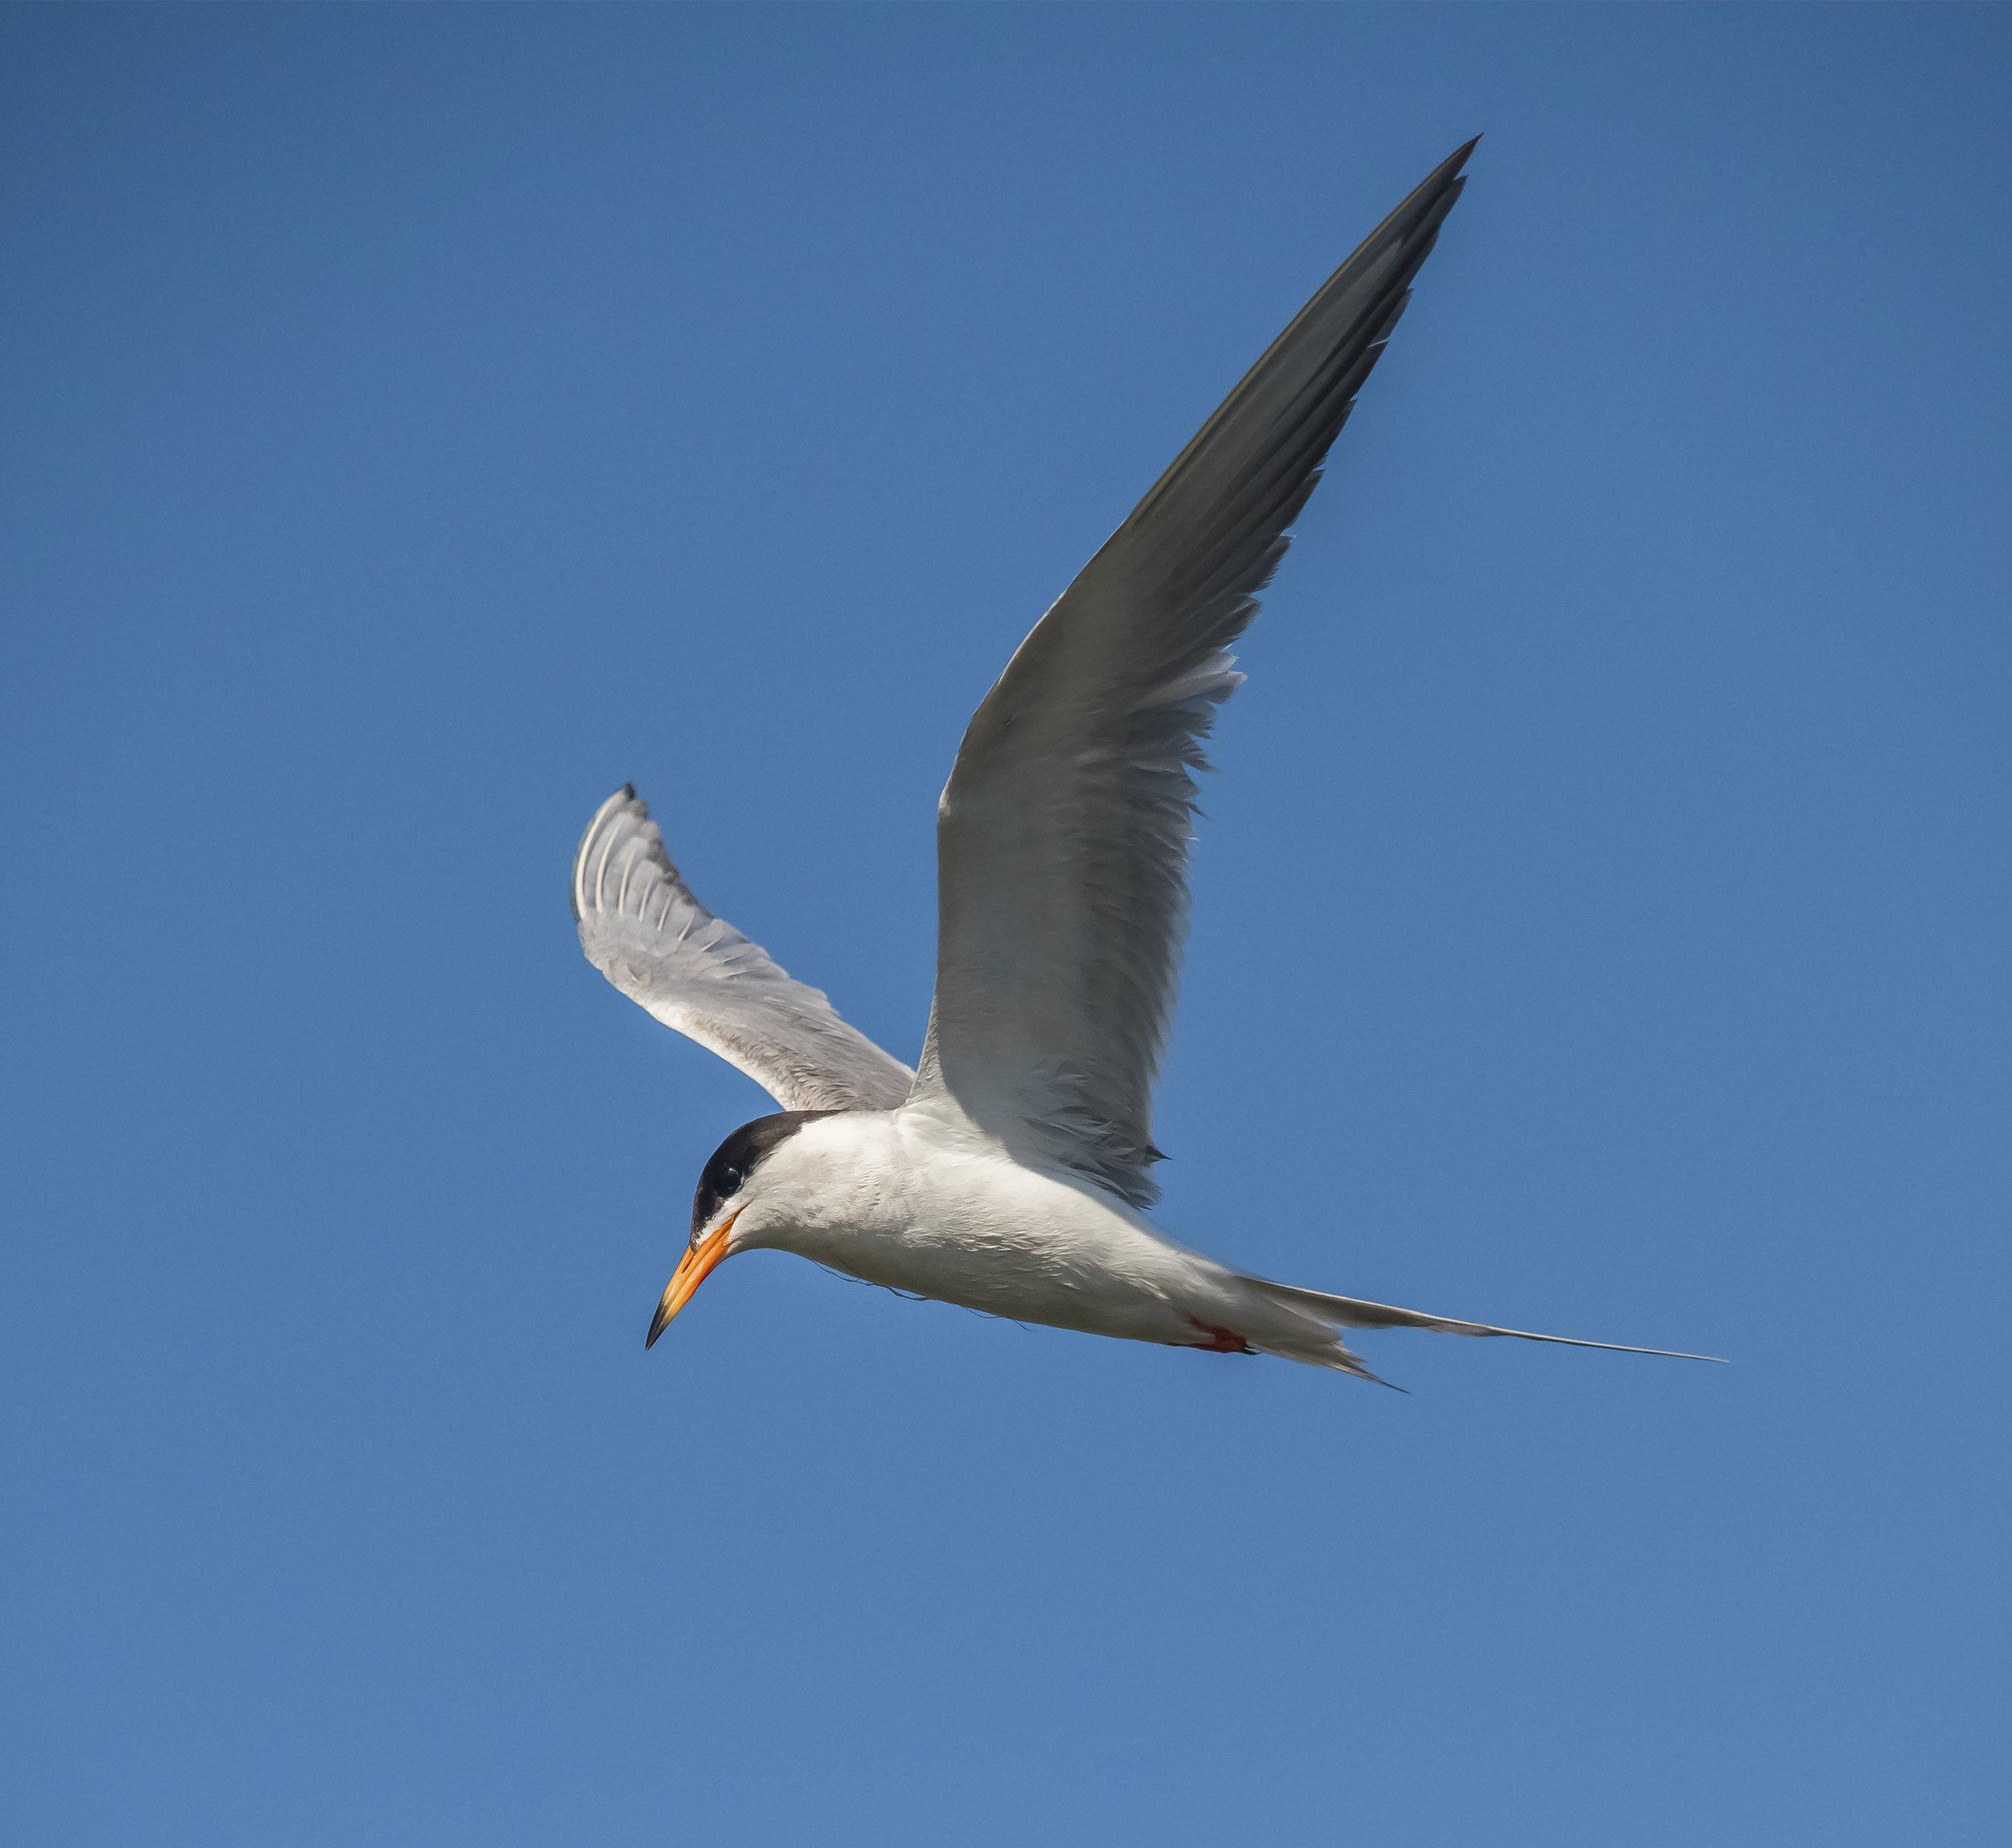 Forster's Tern at Don Edwards San Francisco Bay National Wildlife Refuge, California